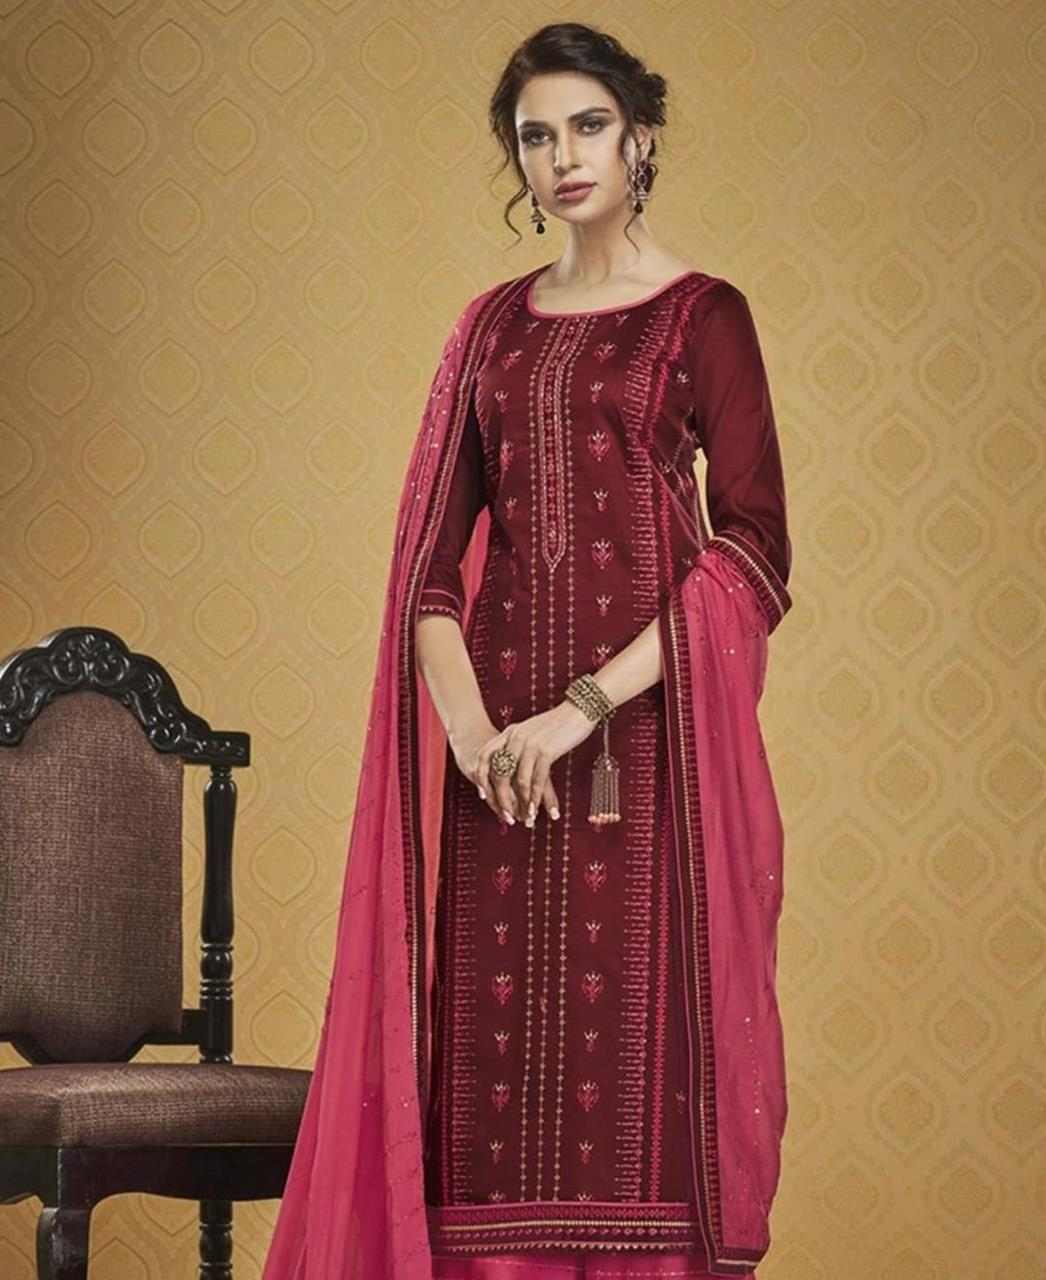 HandWorked Silk Straight cut Salwar Kameez in Maroon